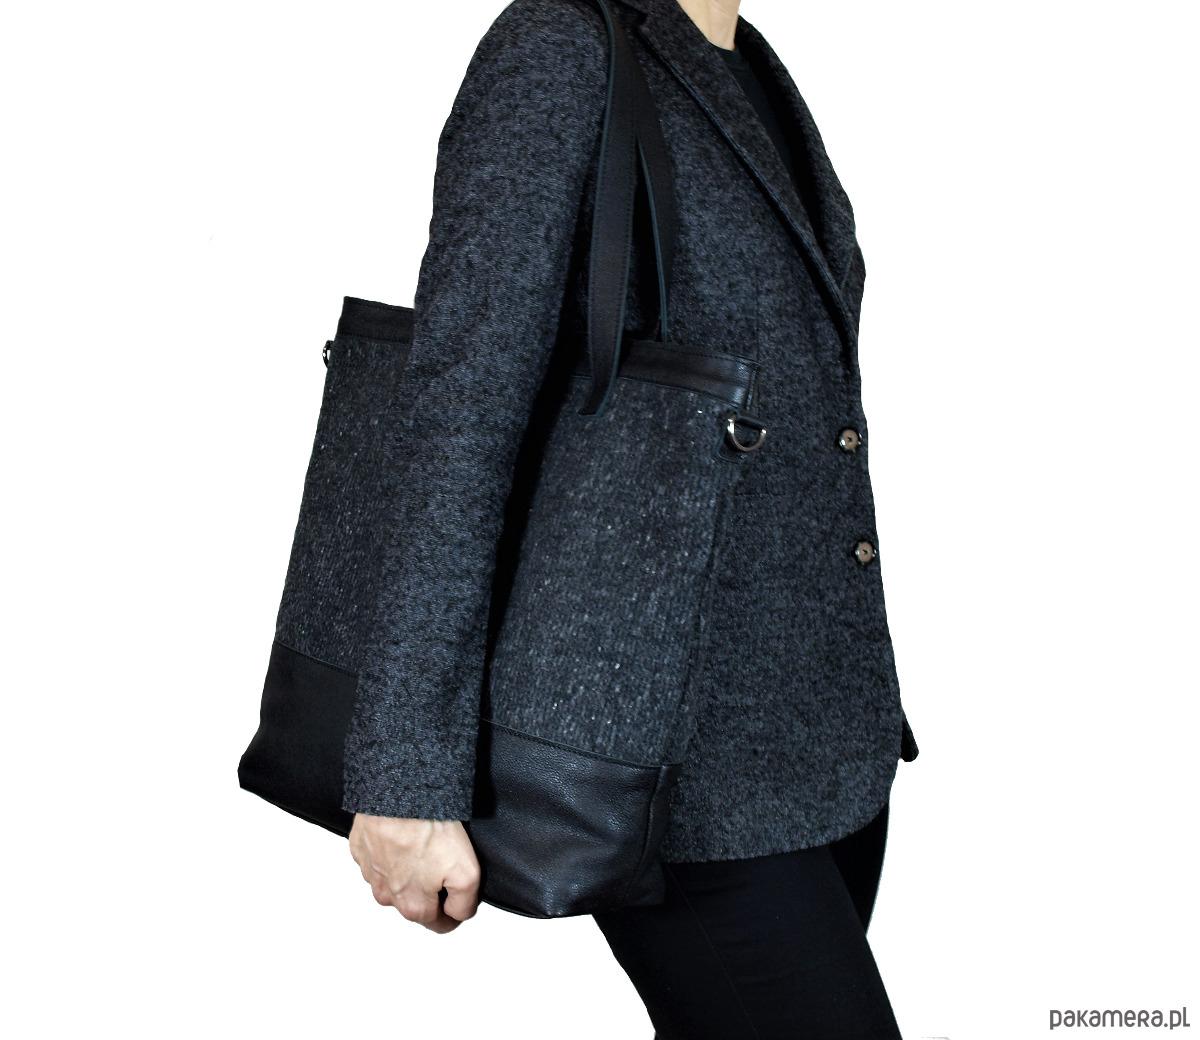 e55d546cc5457 duża szaro czarna torba - torby na ramię - damskie - Pakamera.pl